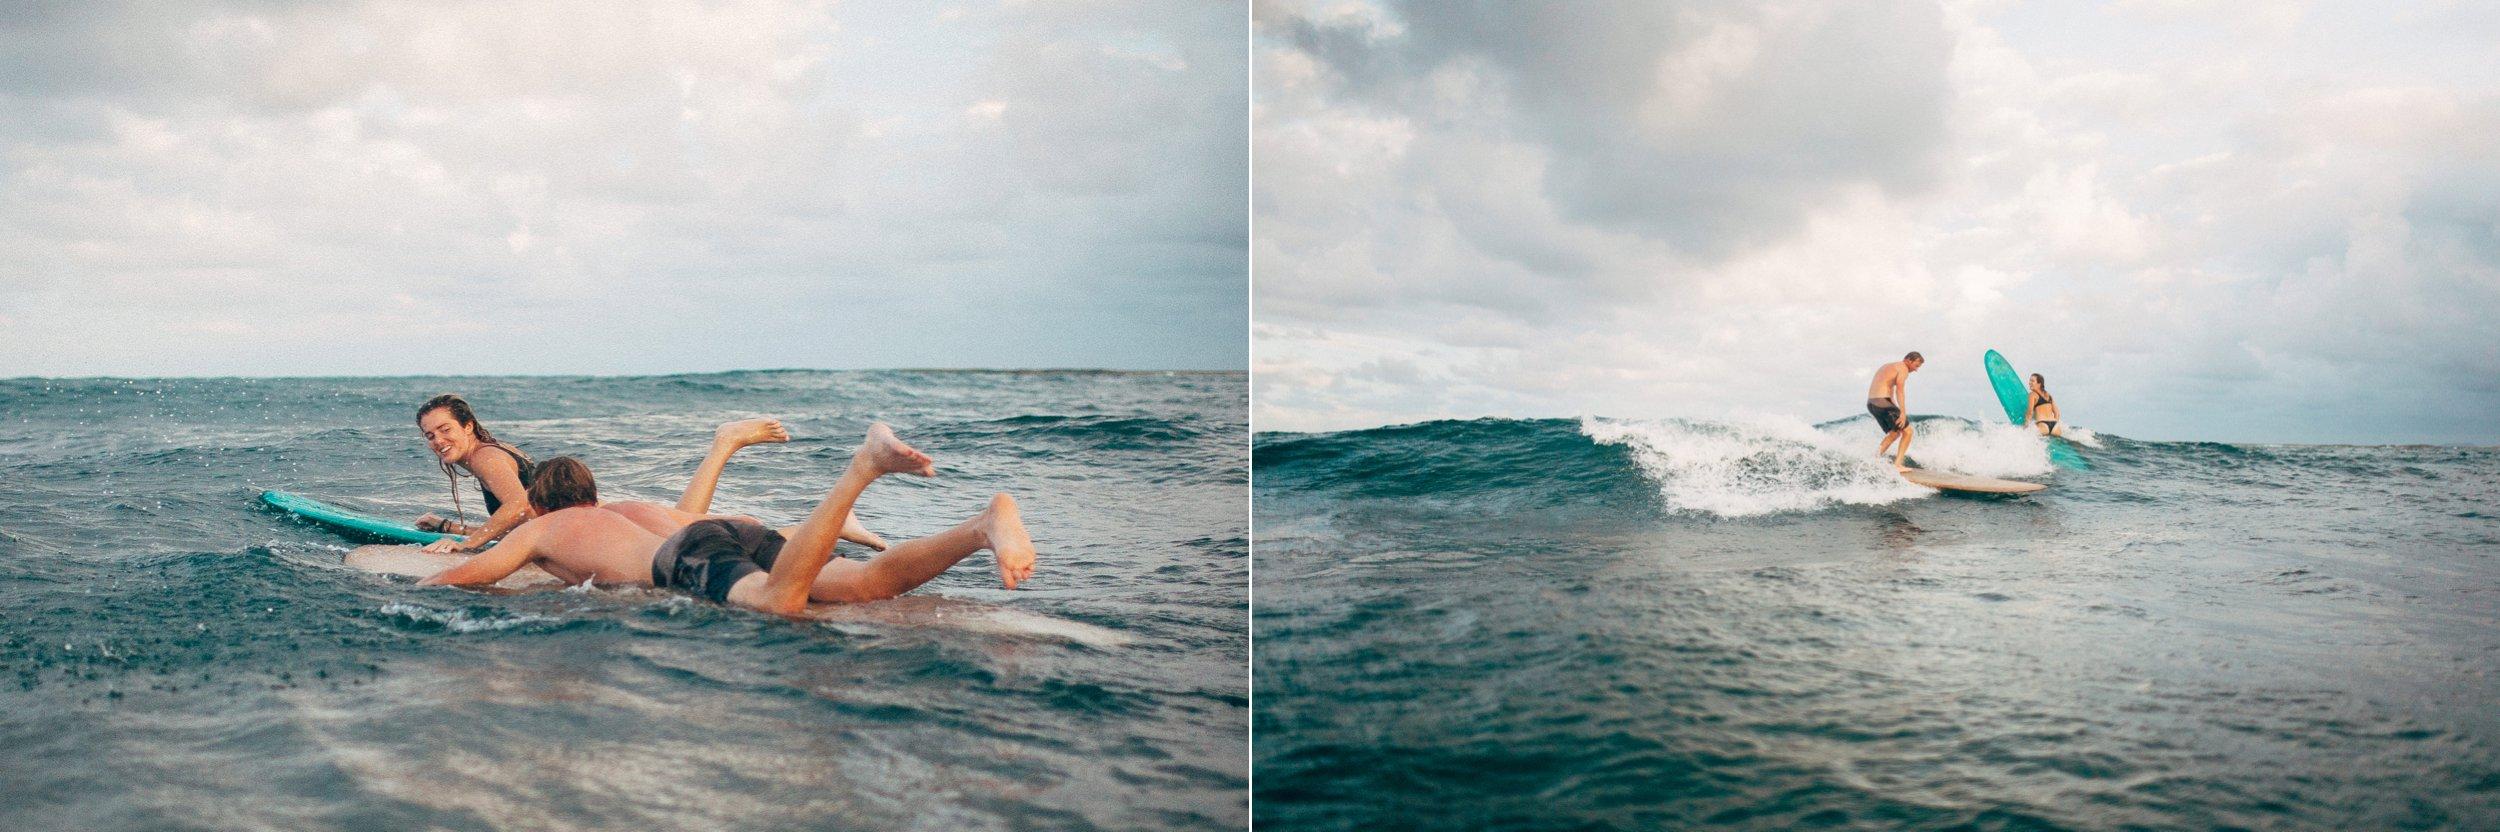 surfing-adventure-couple-session_0011.jpg